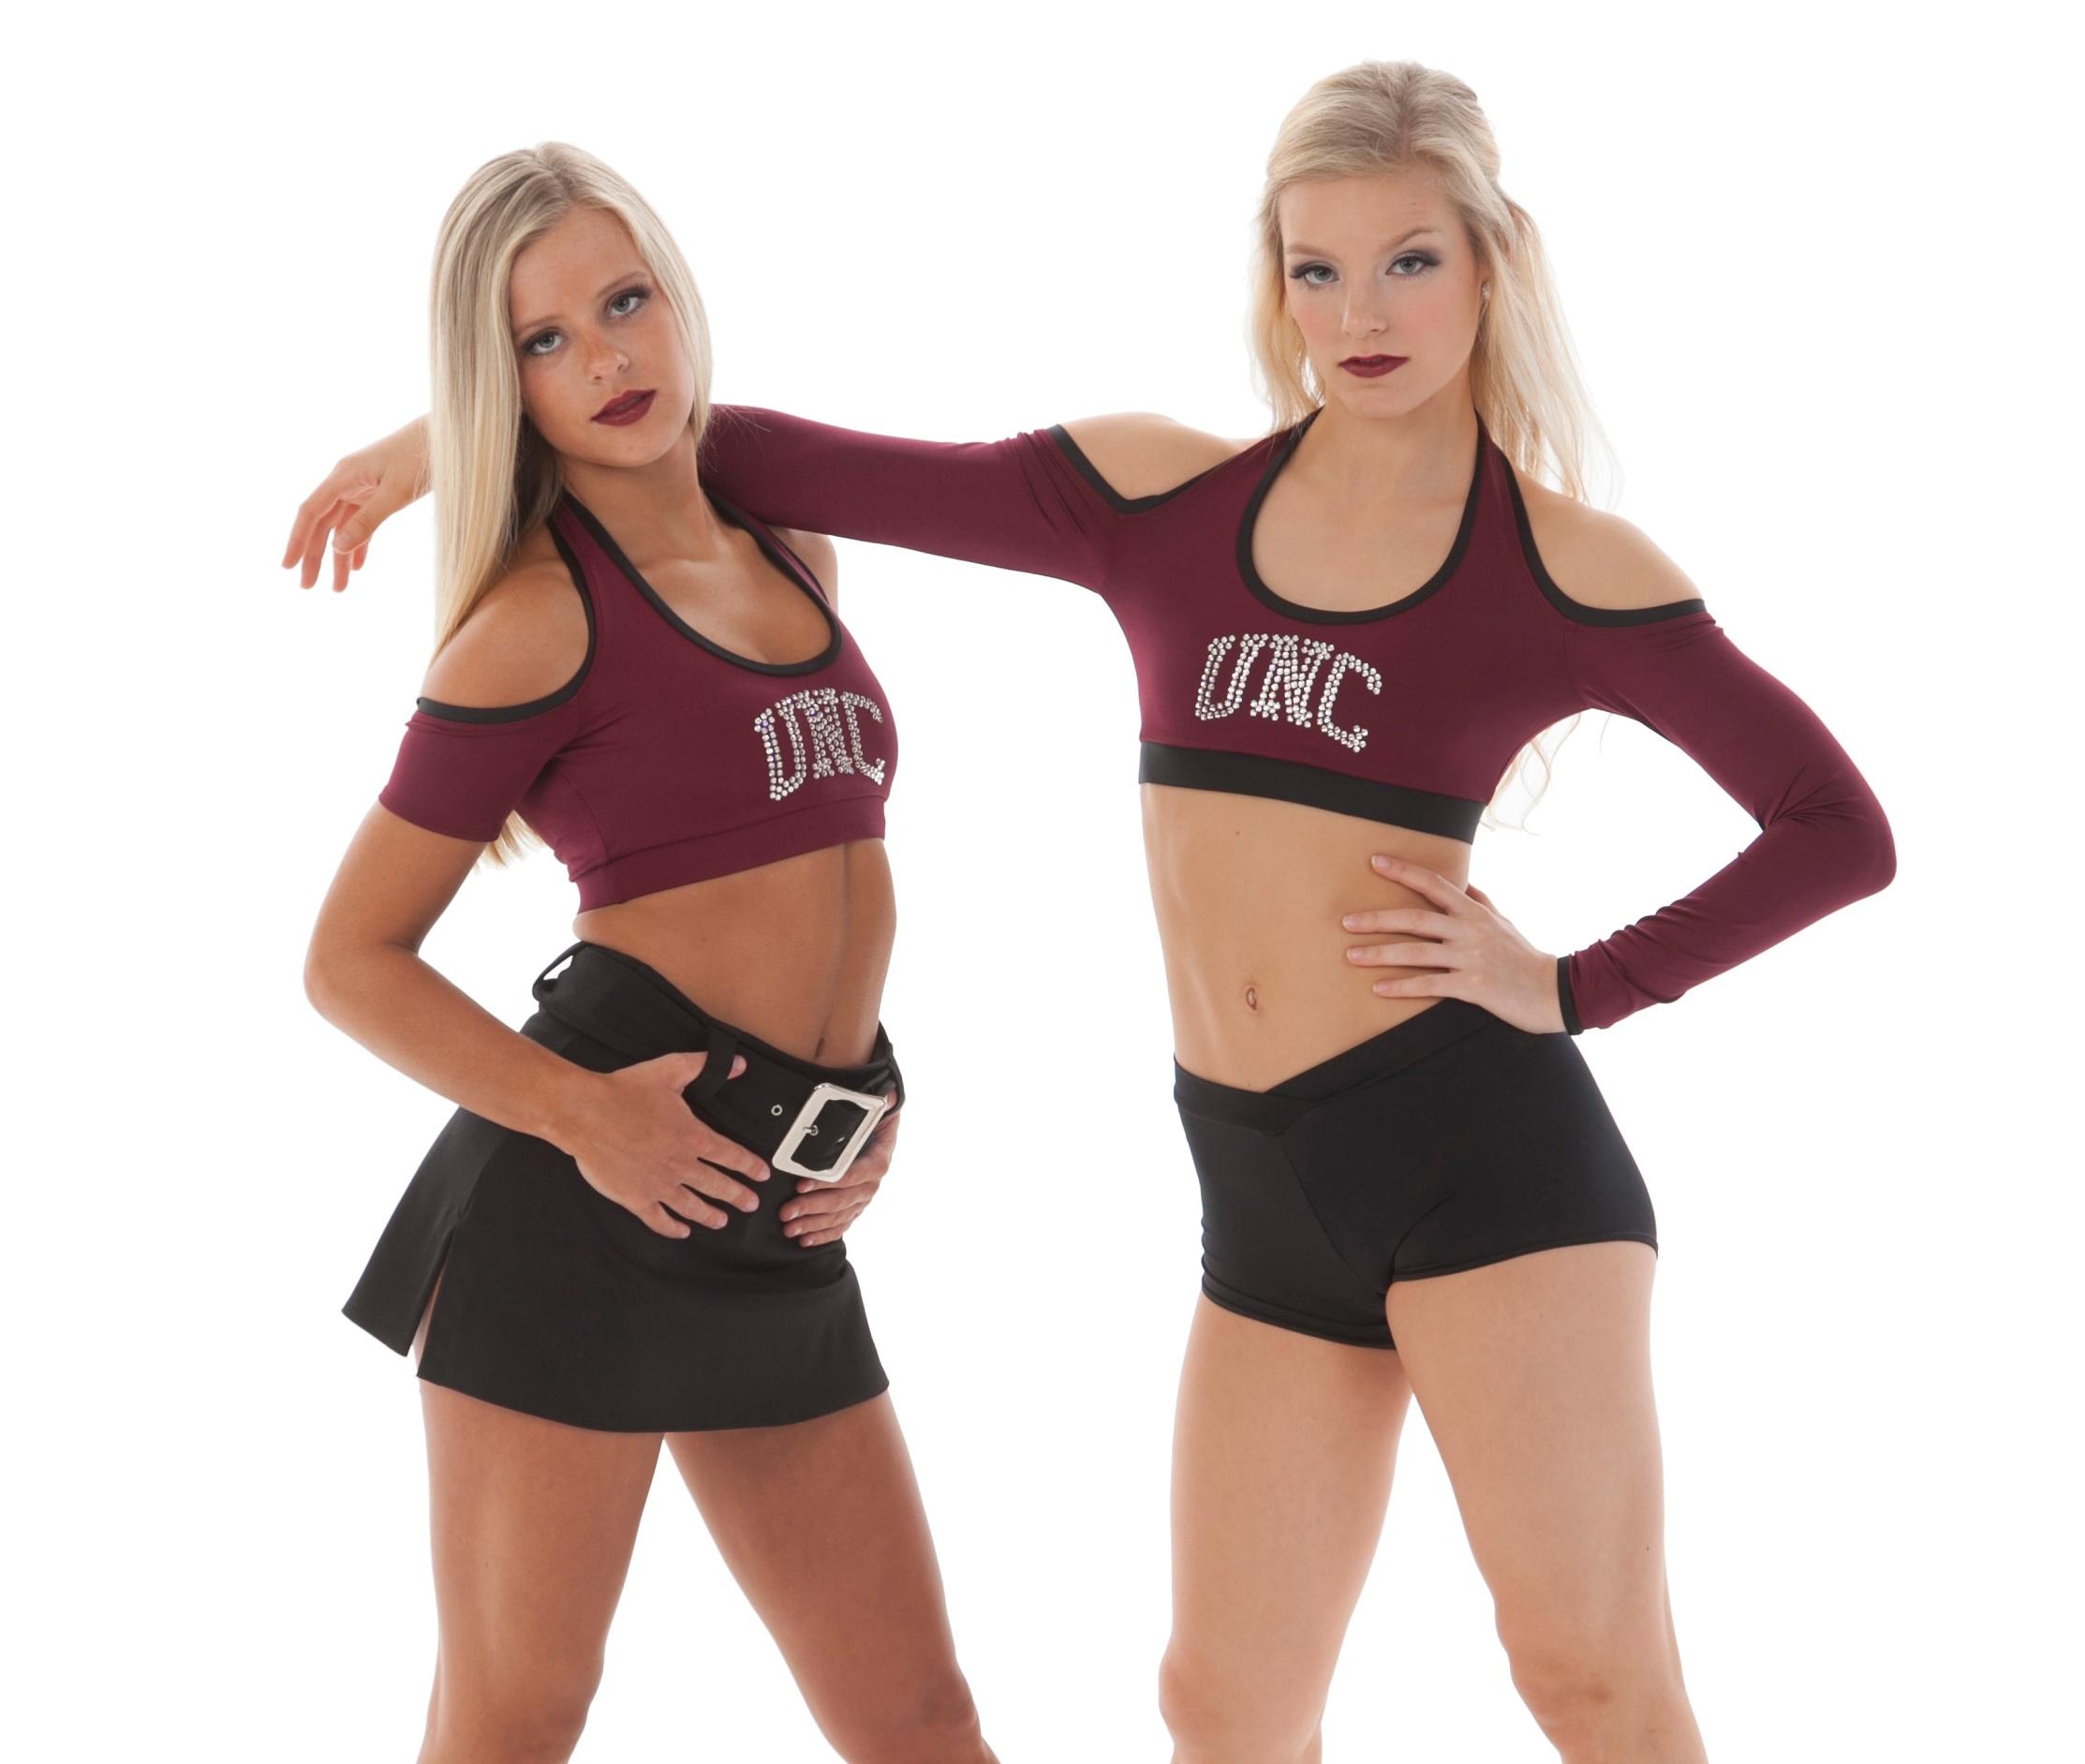 Cheer uniform trend: cold shoulder